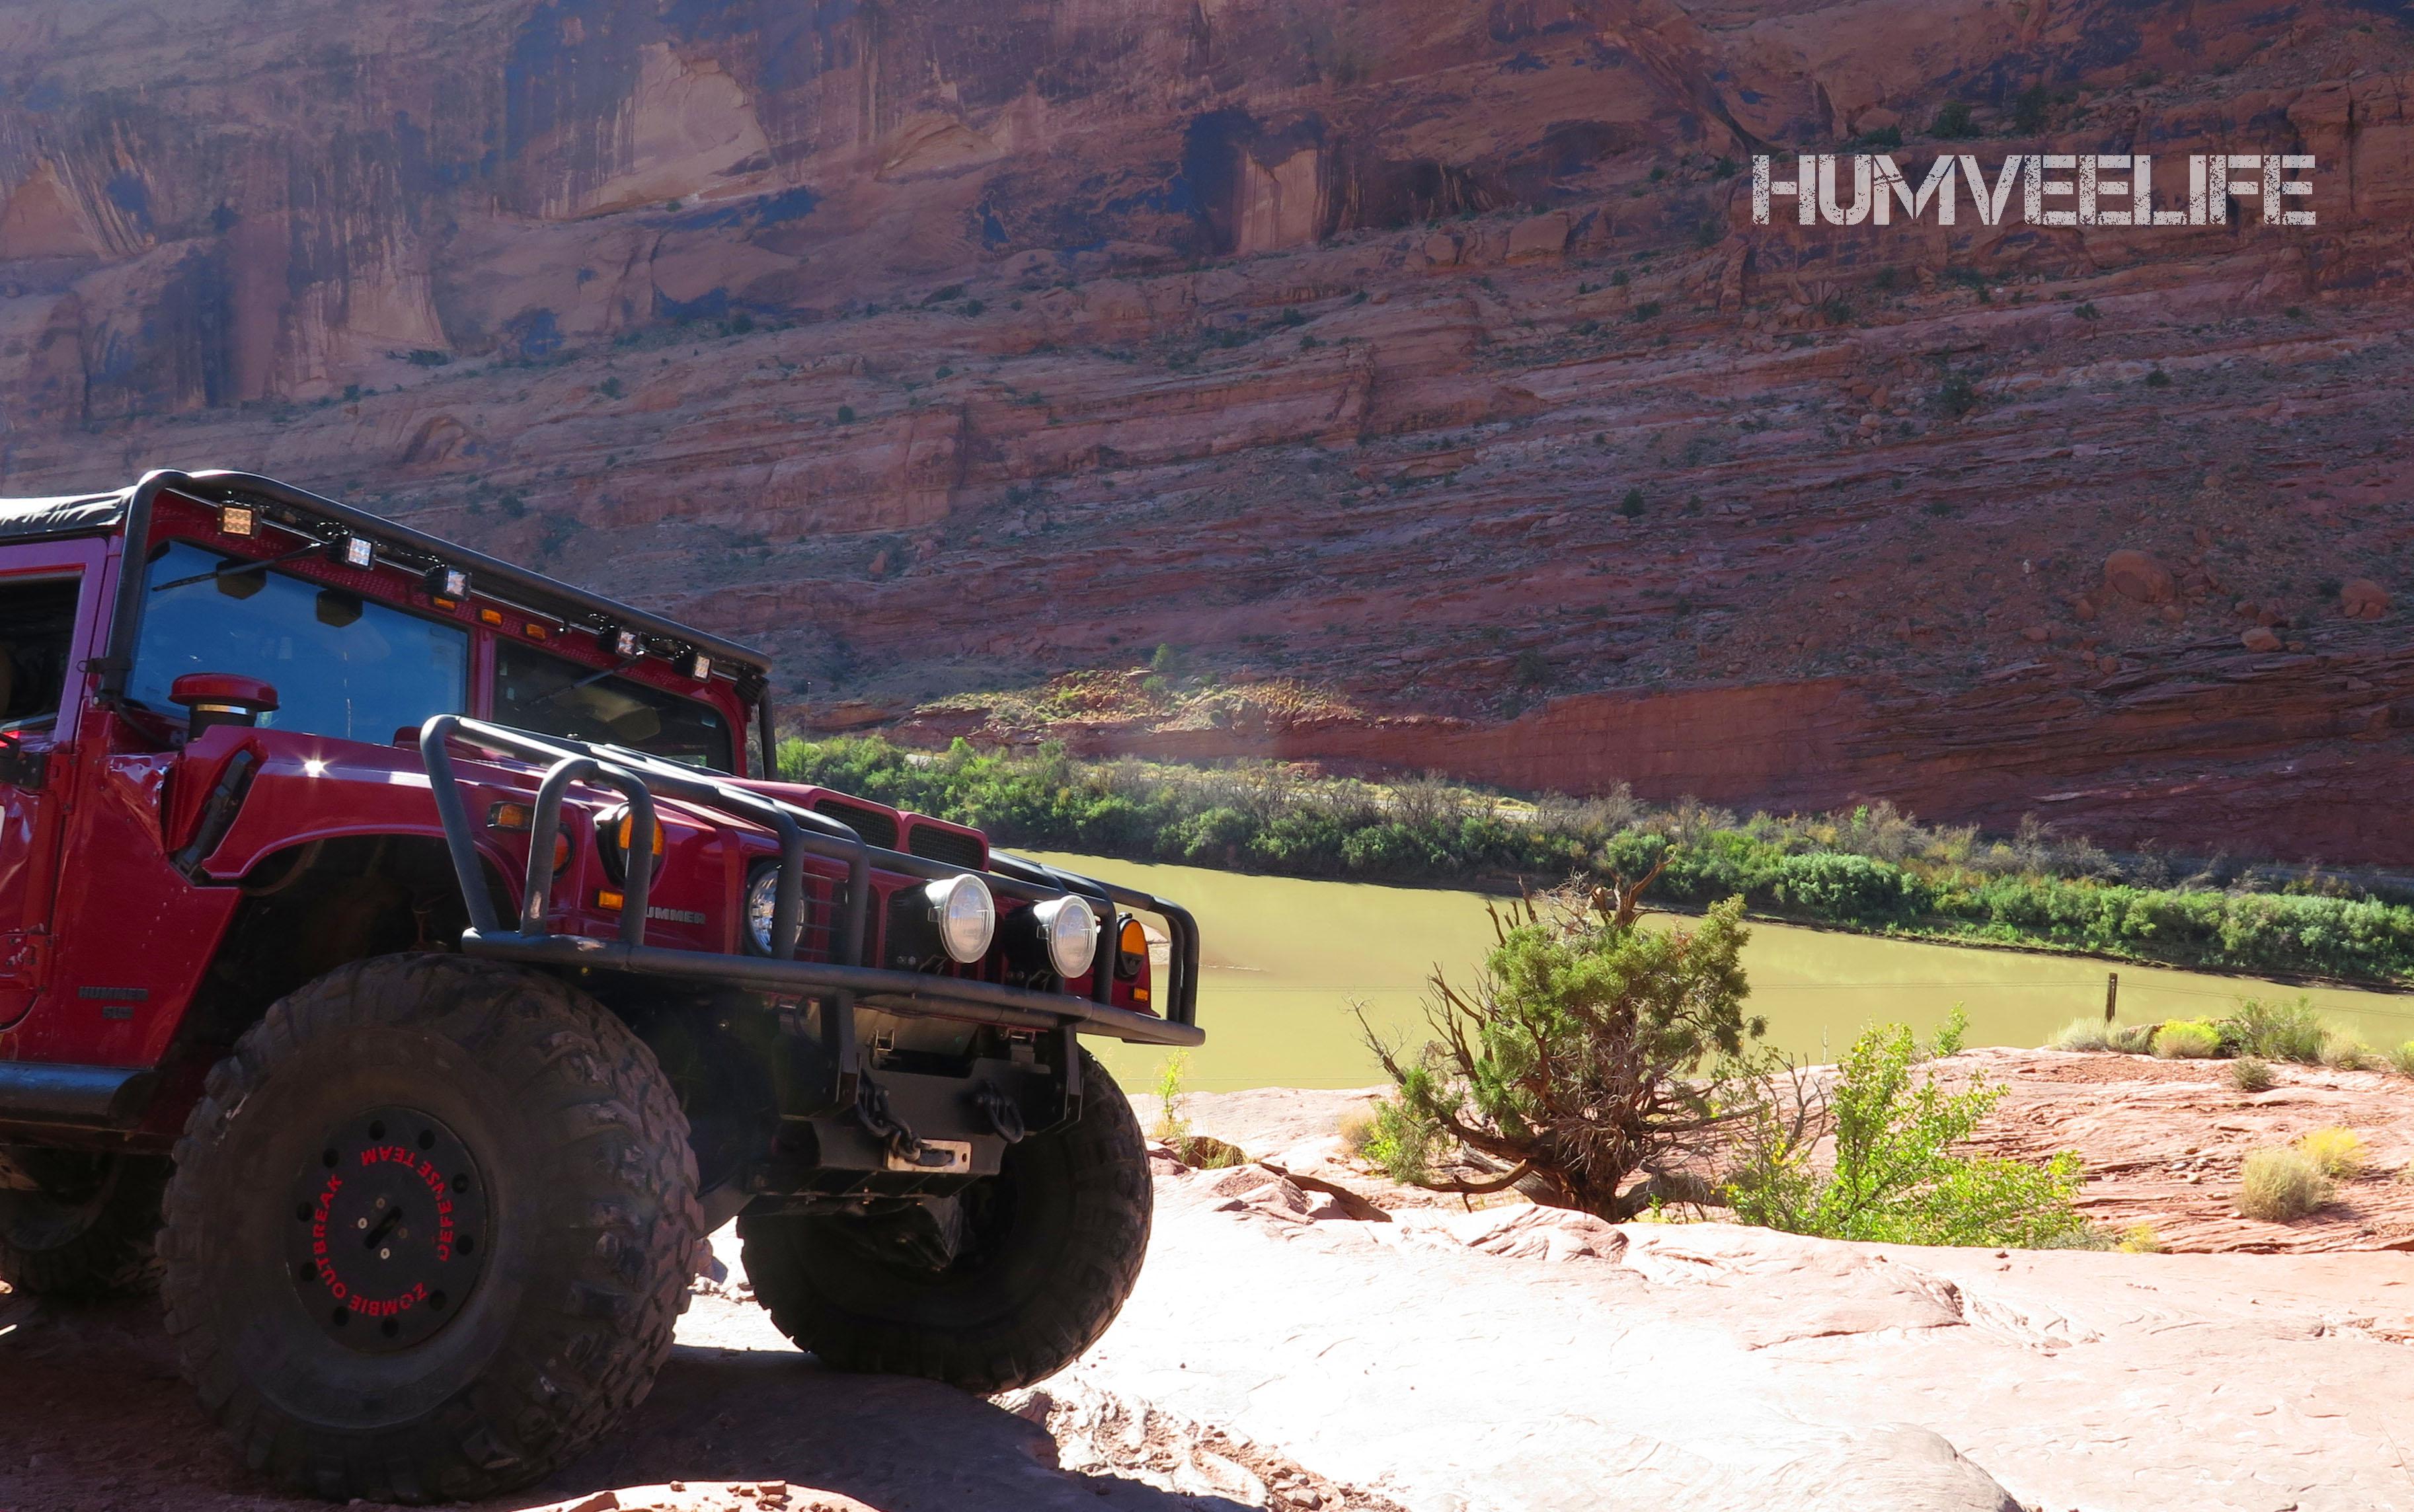 HumveeLife Moab 2015 - Pack 2 #7C